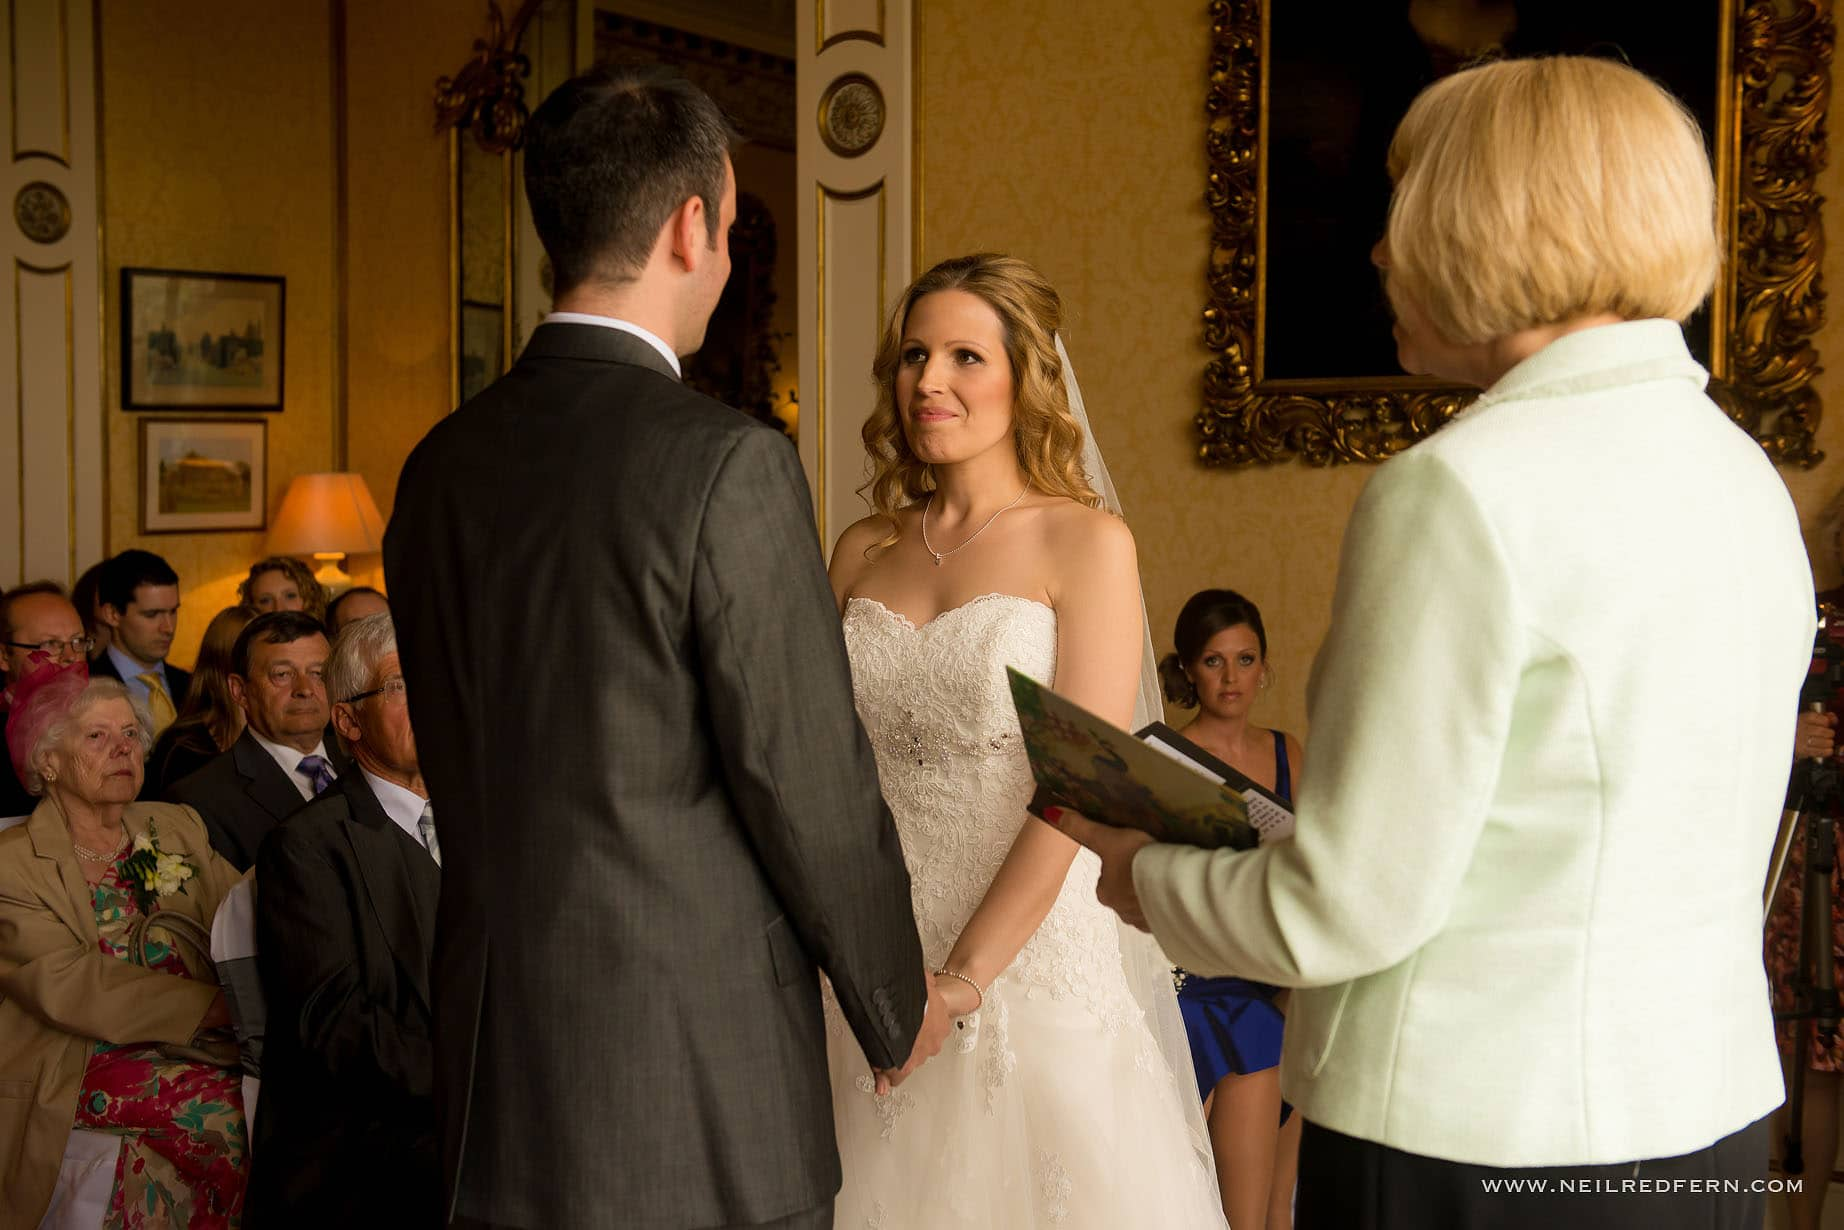 wedding ceremony at Arley Hall